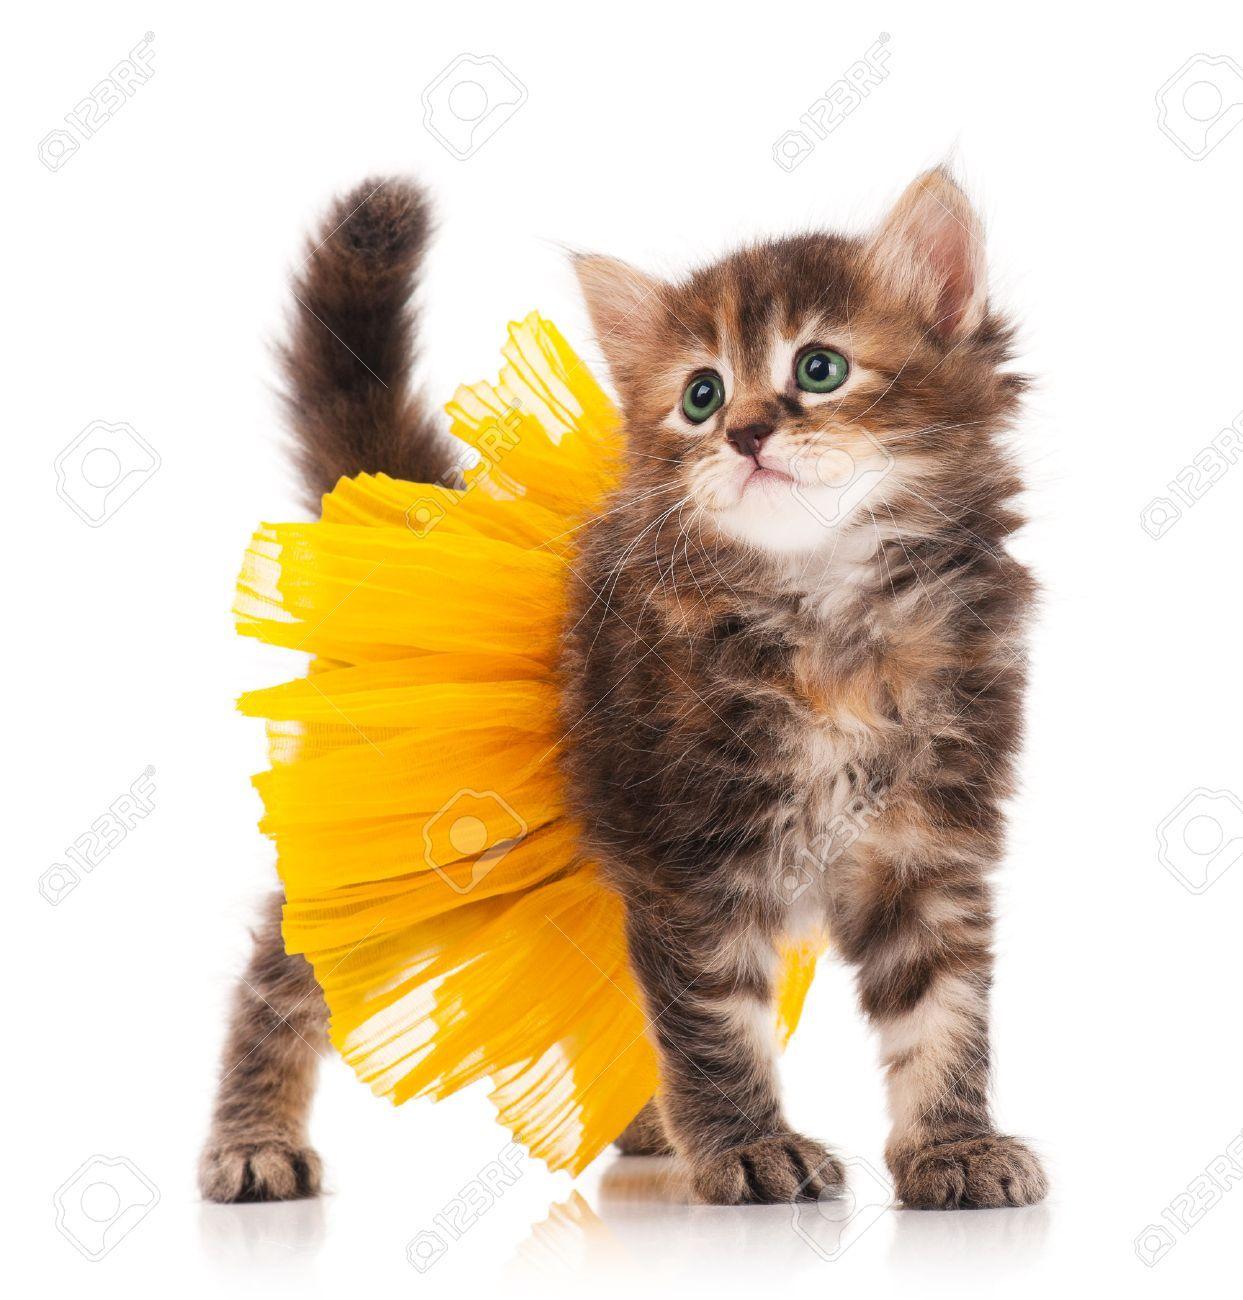 Stock Photo Cute Fluffy Kittens Kitten Costumes Kittens Cutest